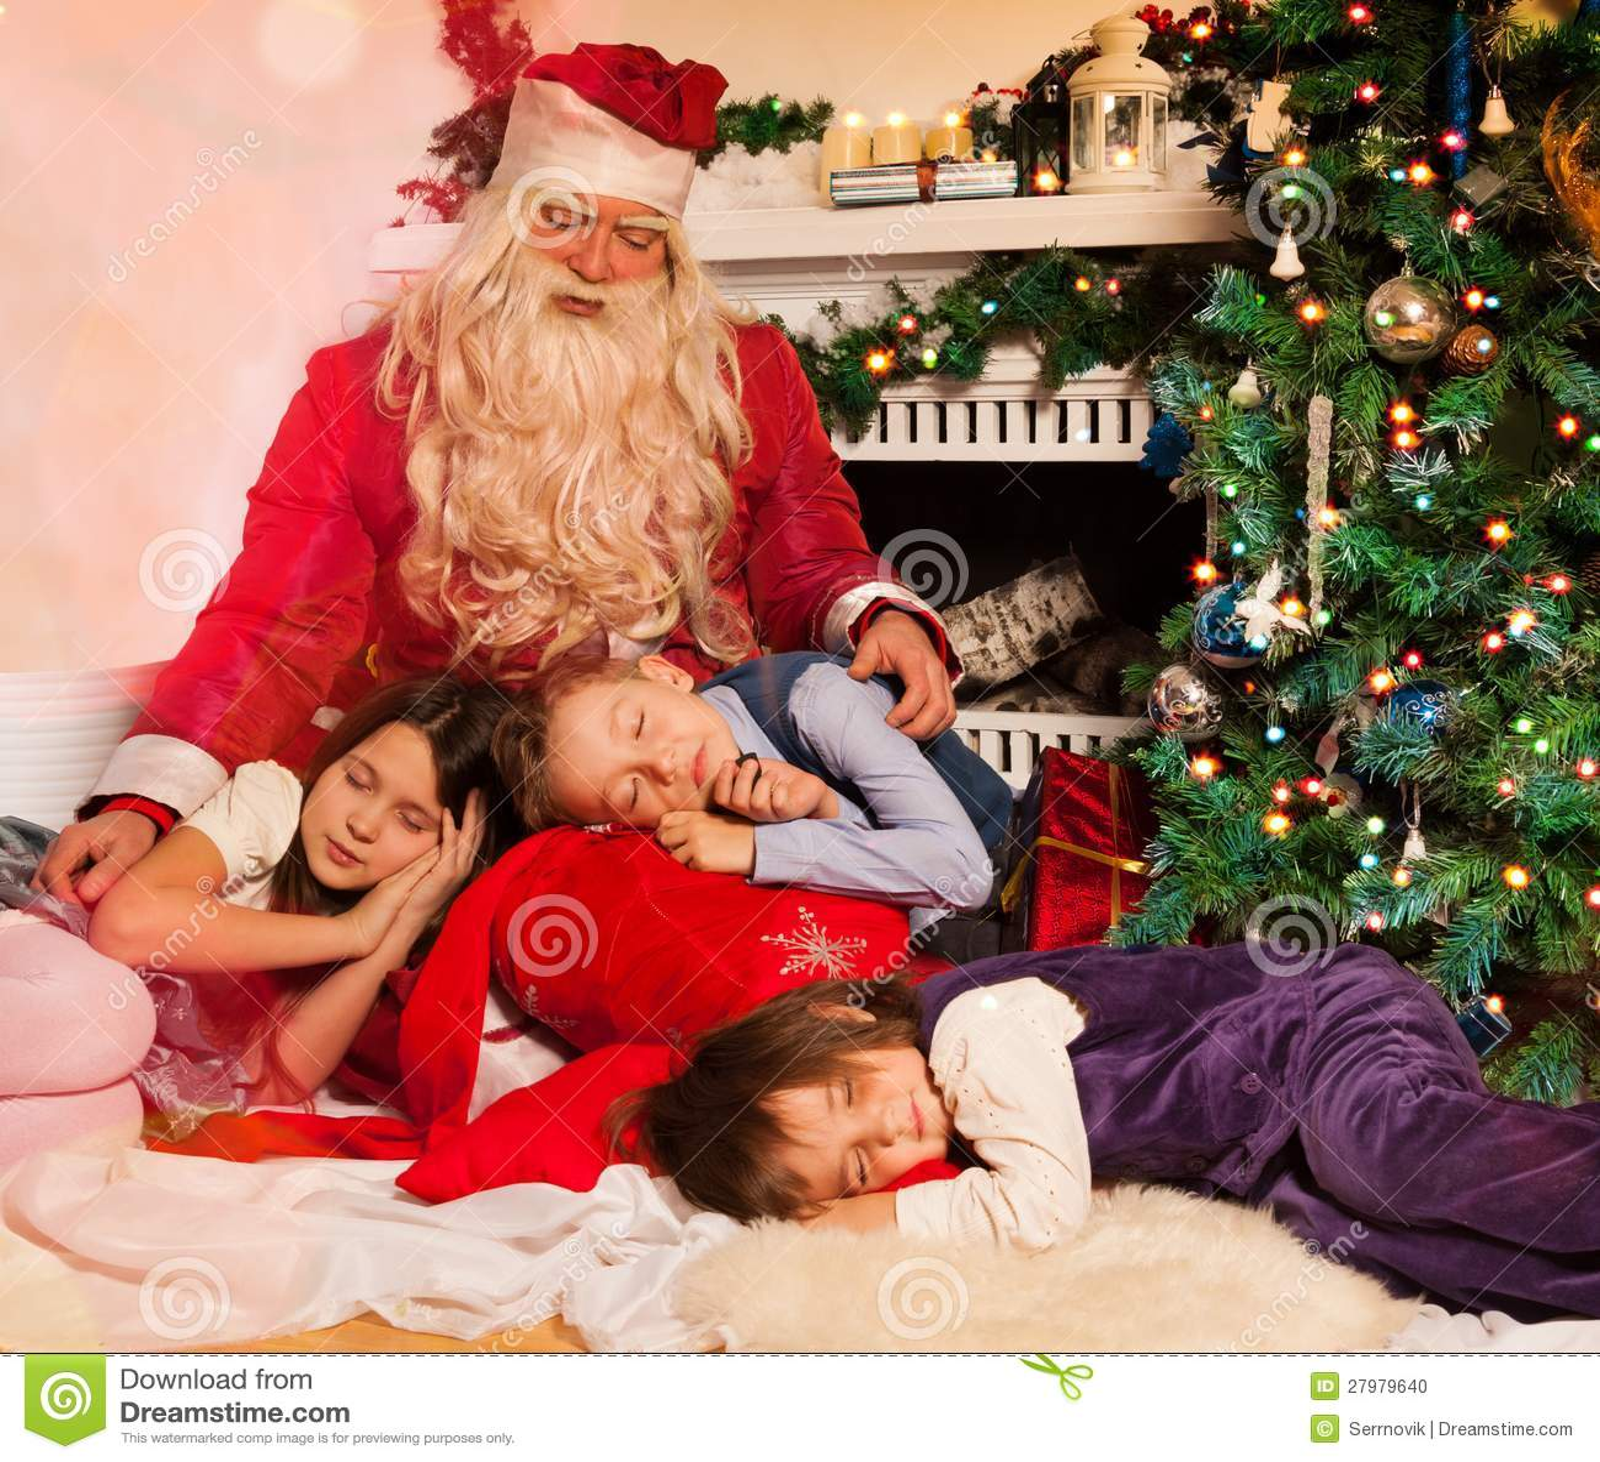 Santa claus and sleeping kids stock photo image